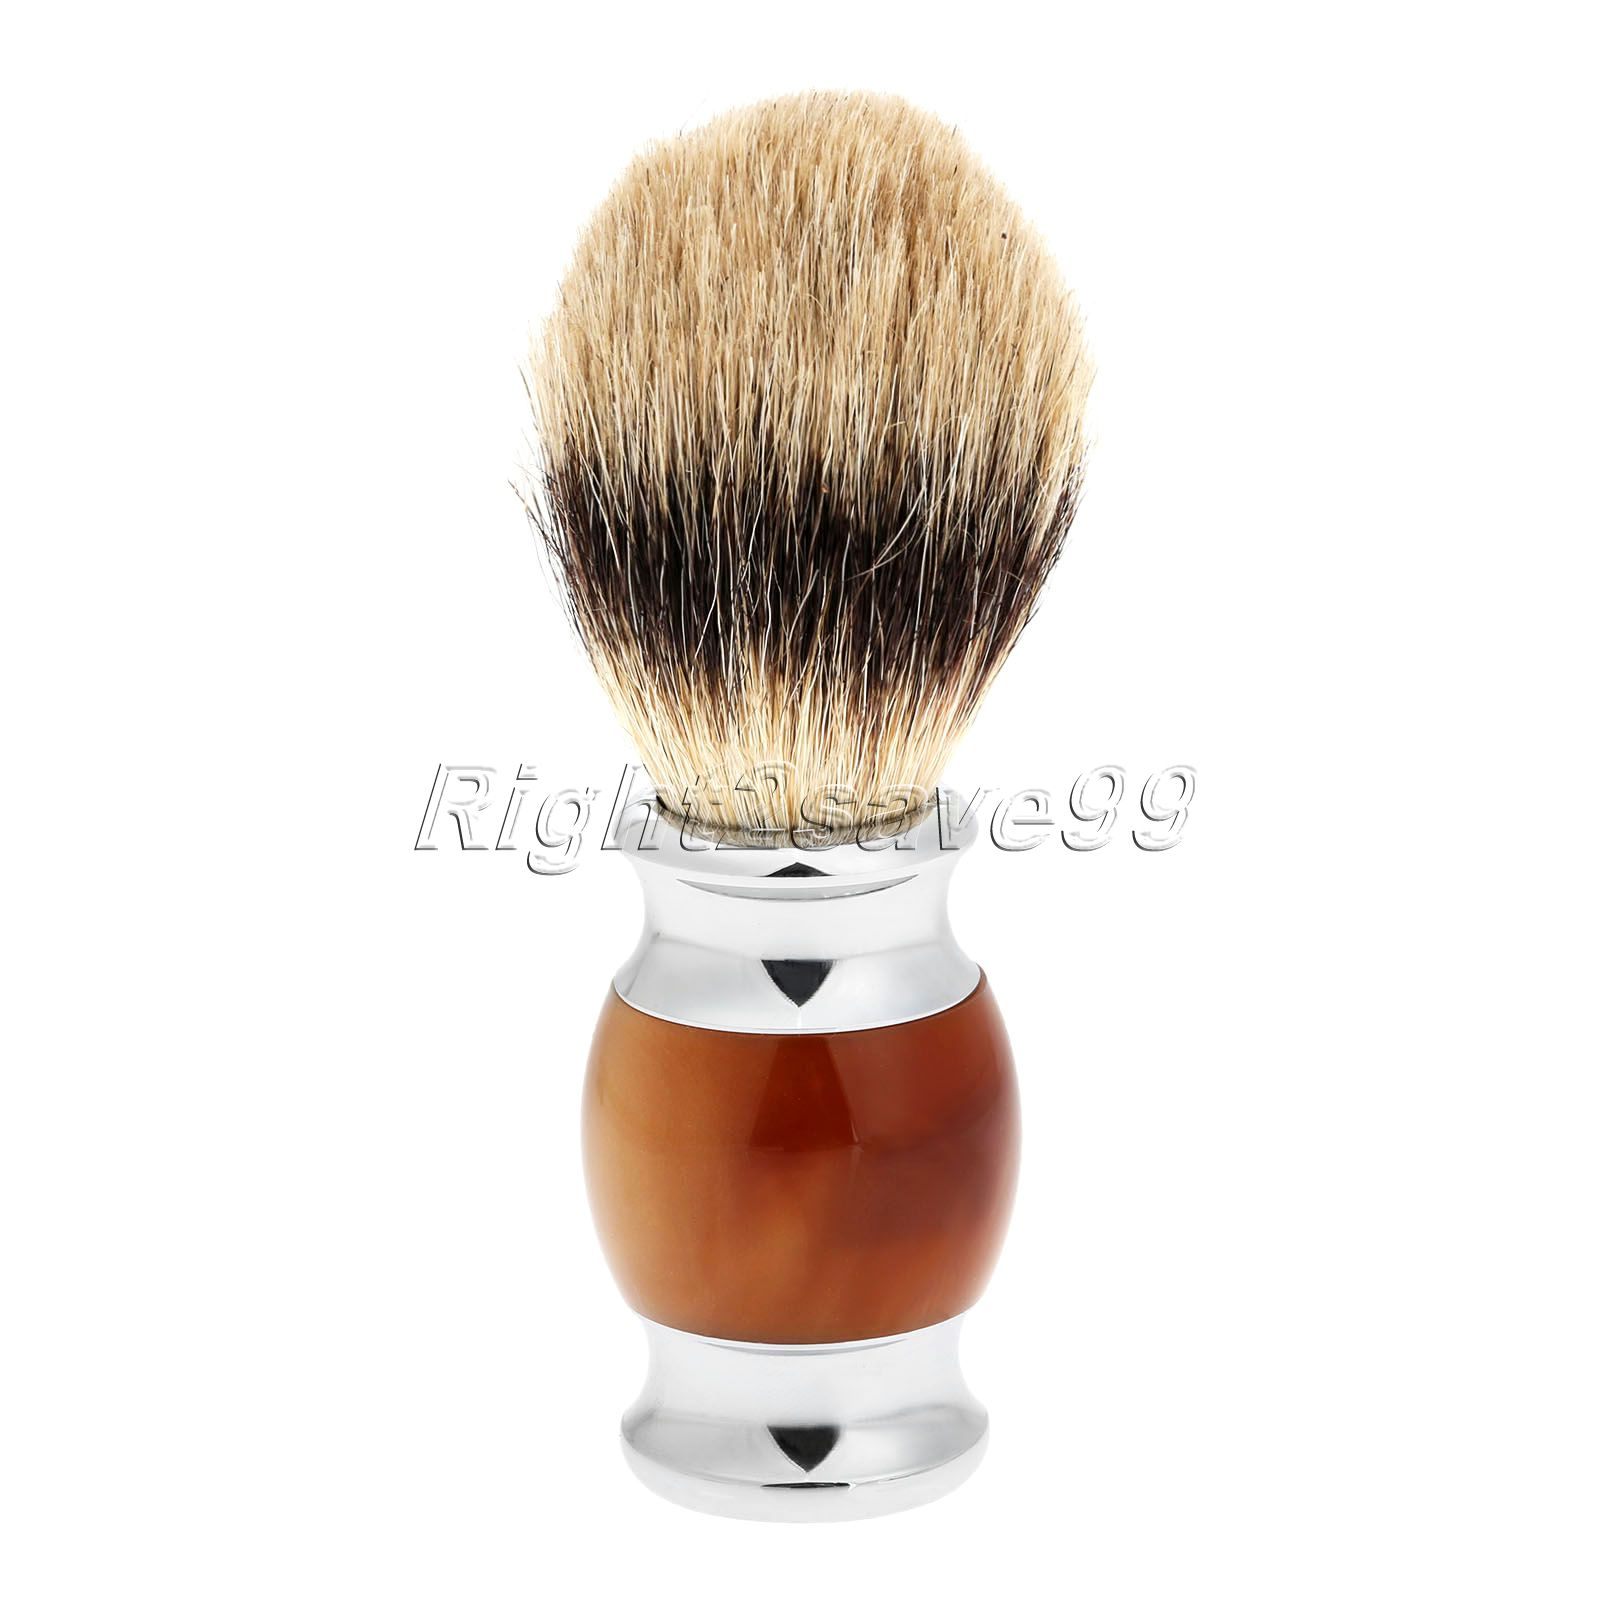 2017 High Quality Pure Badger Hair Shaving Brush Resin Handle Barber Salon Men Facial Beard Brush Pincel Shave Tool Beauty Tool